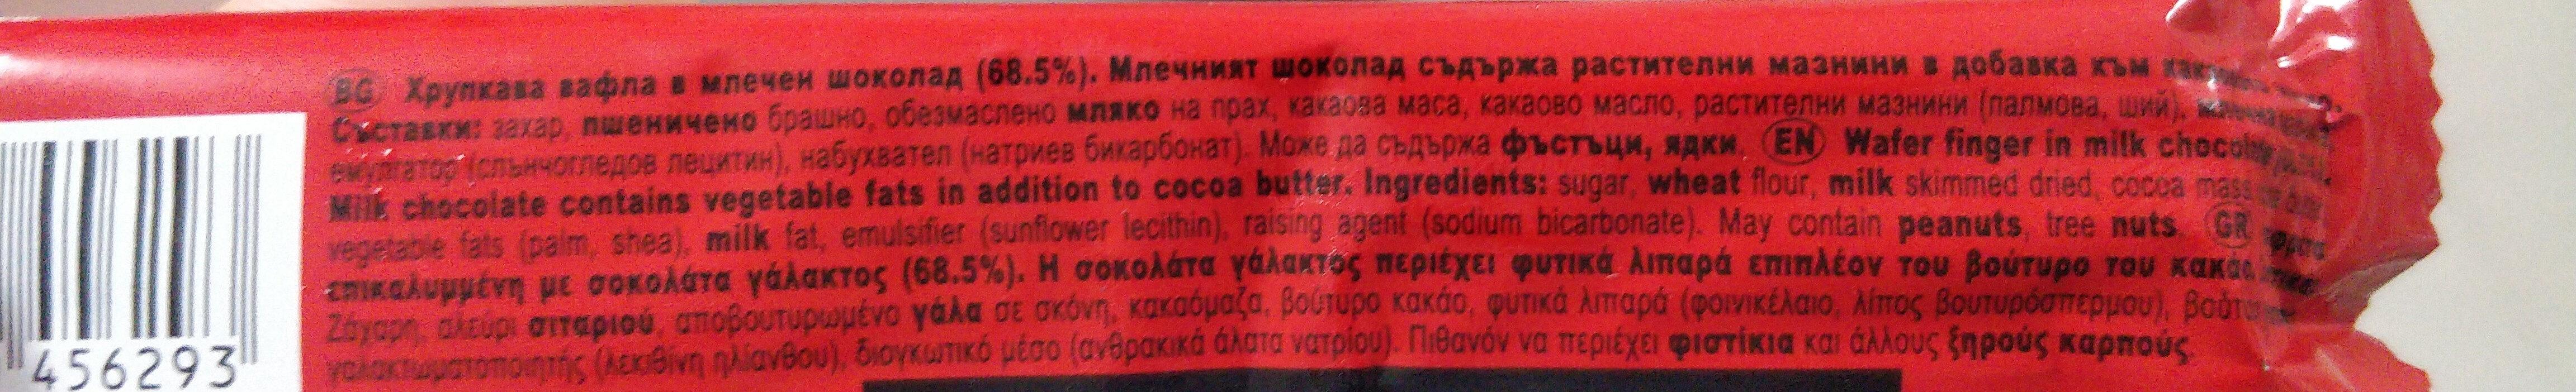 Kit kat chunky - Ingrédients - en